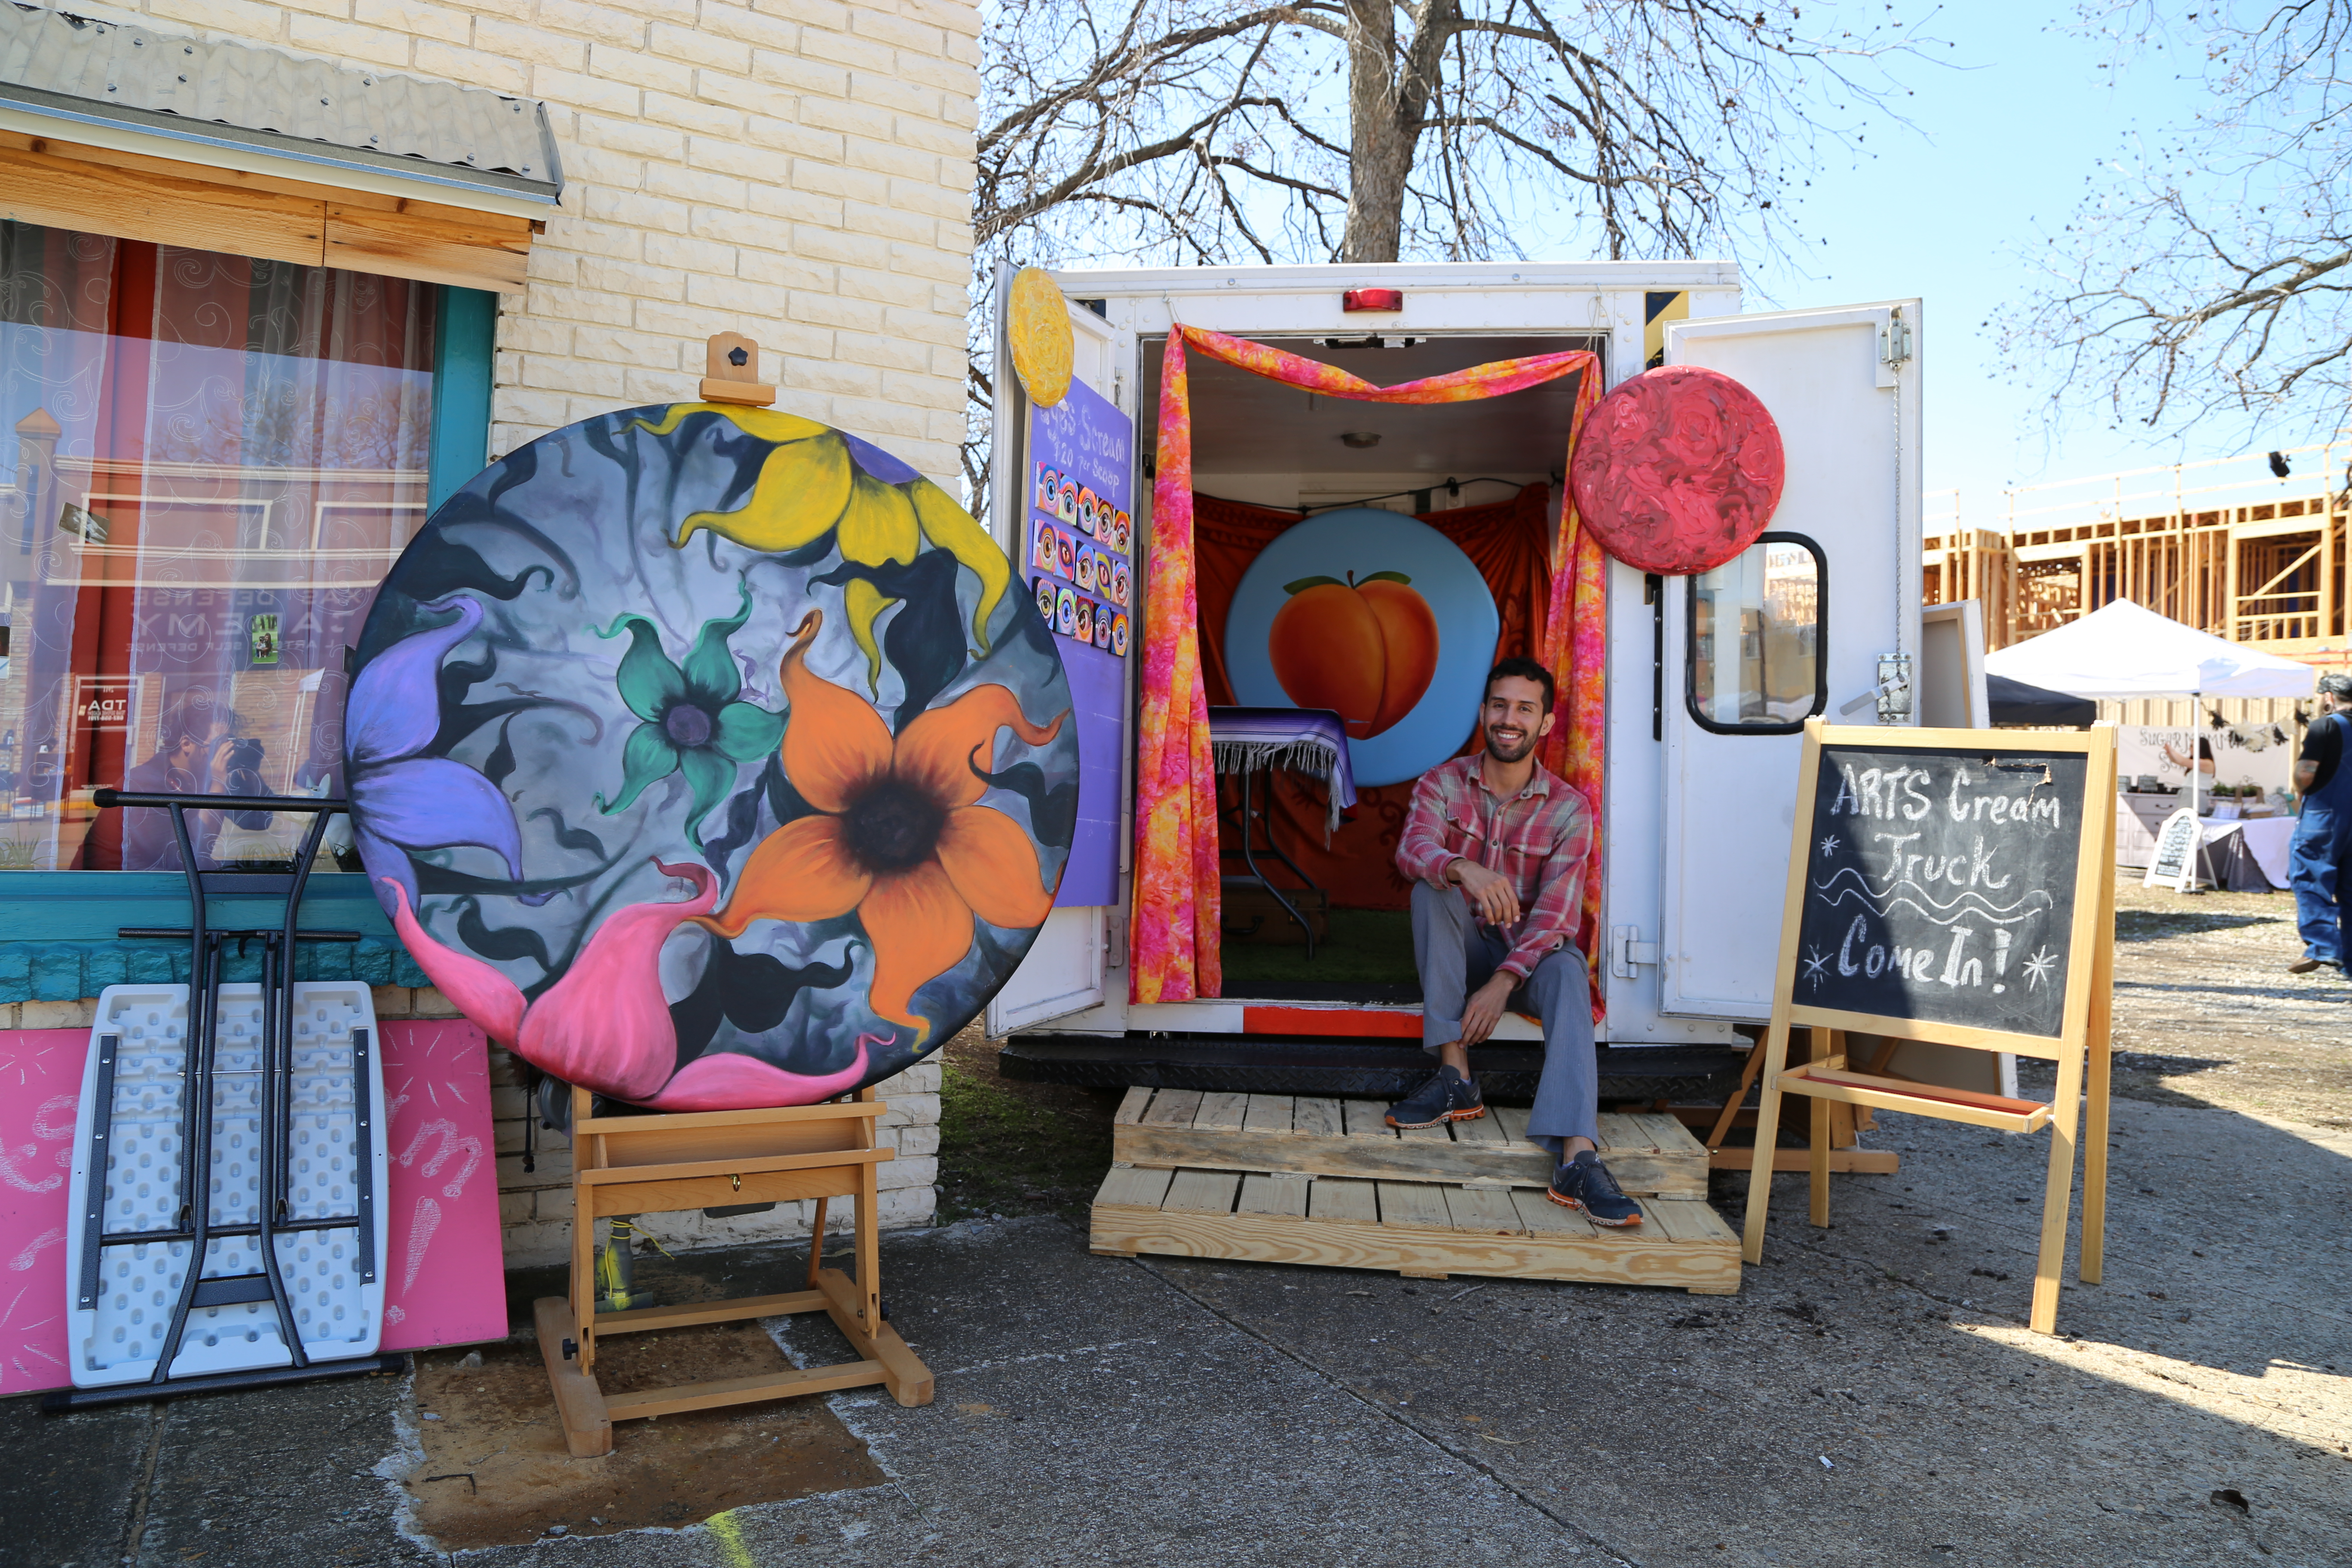 A peek inside of Arnoldo Hurtado's ArtsCream Truck.